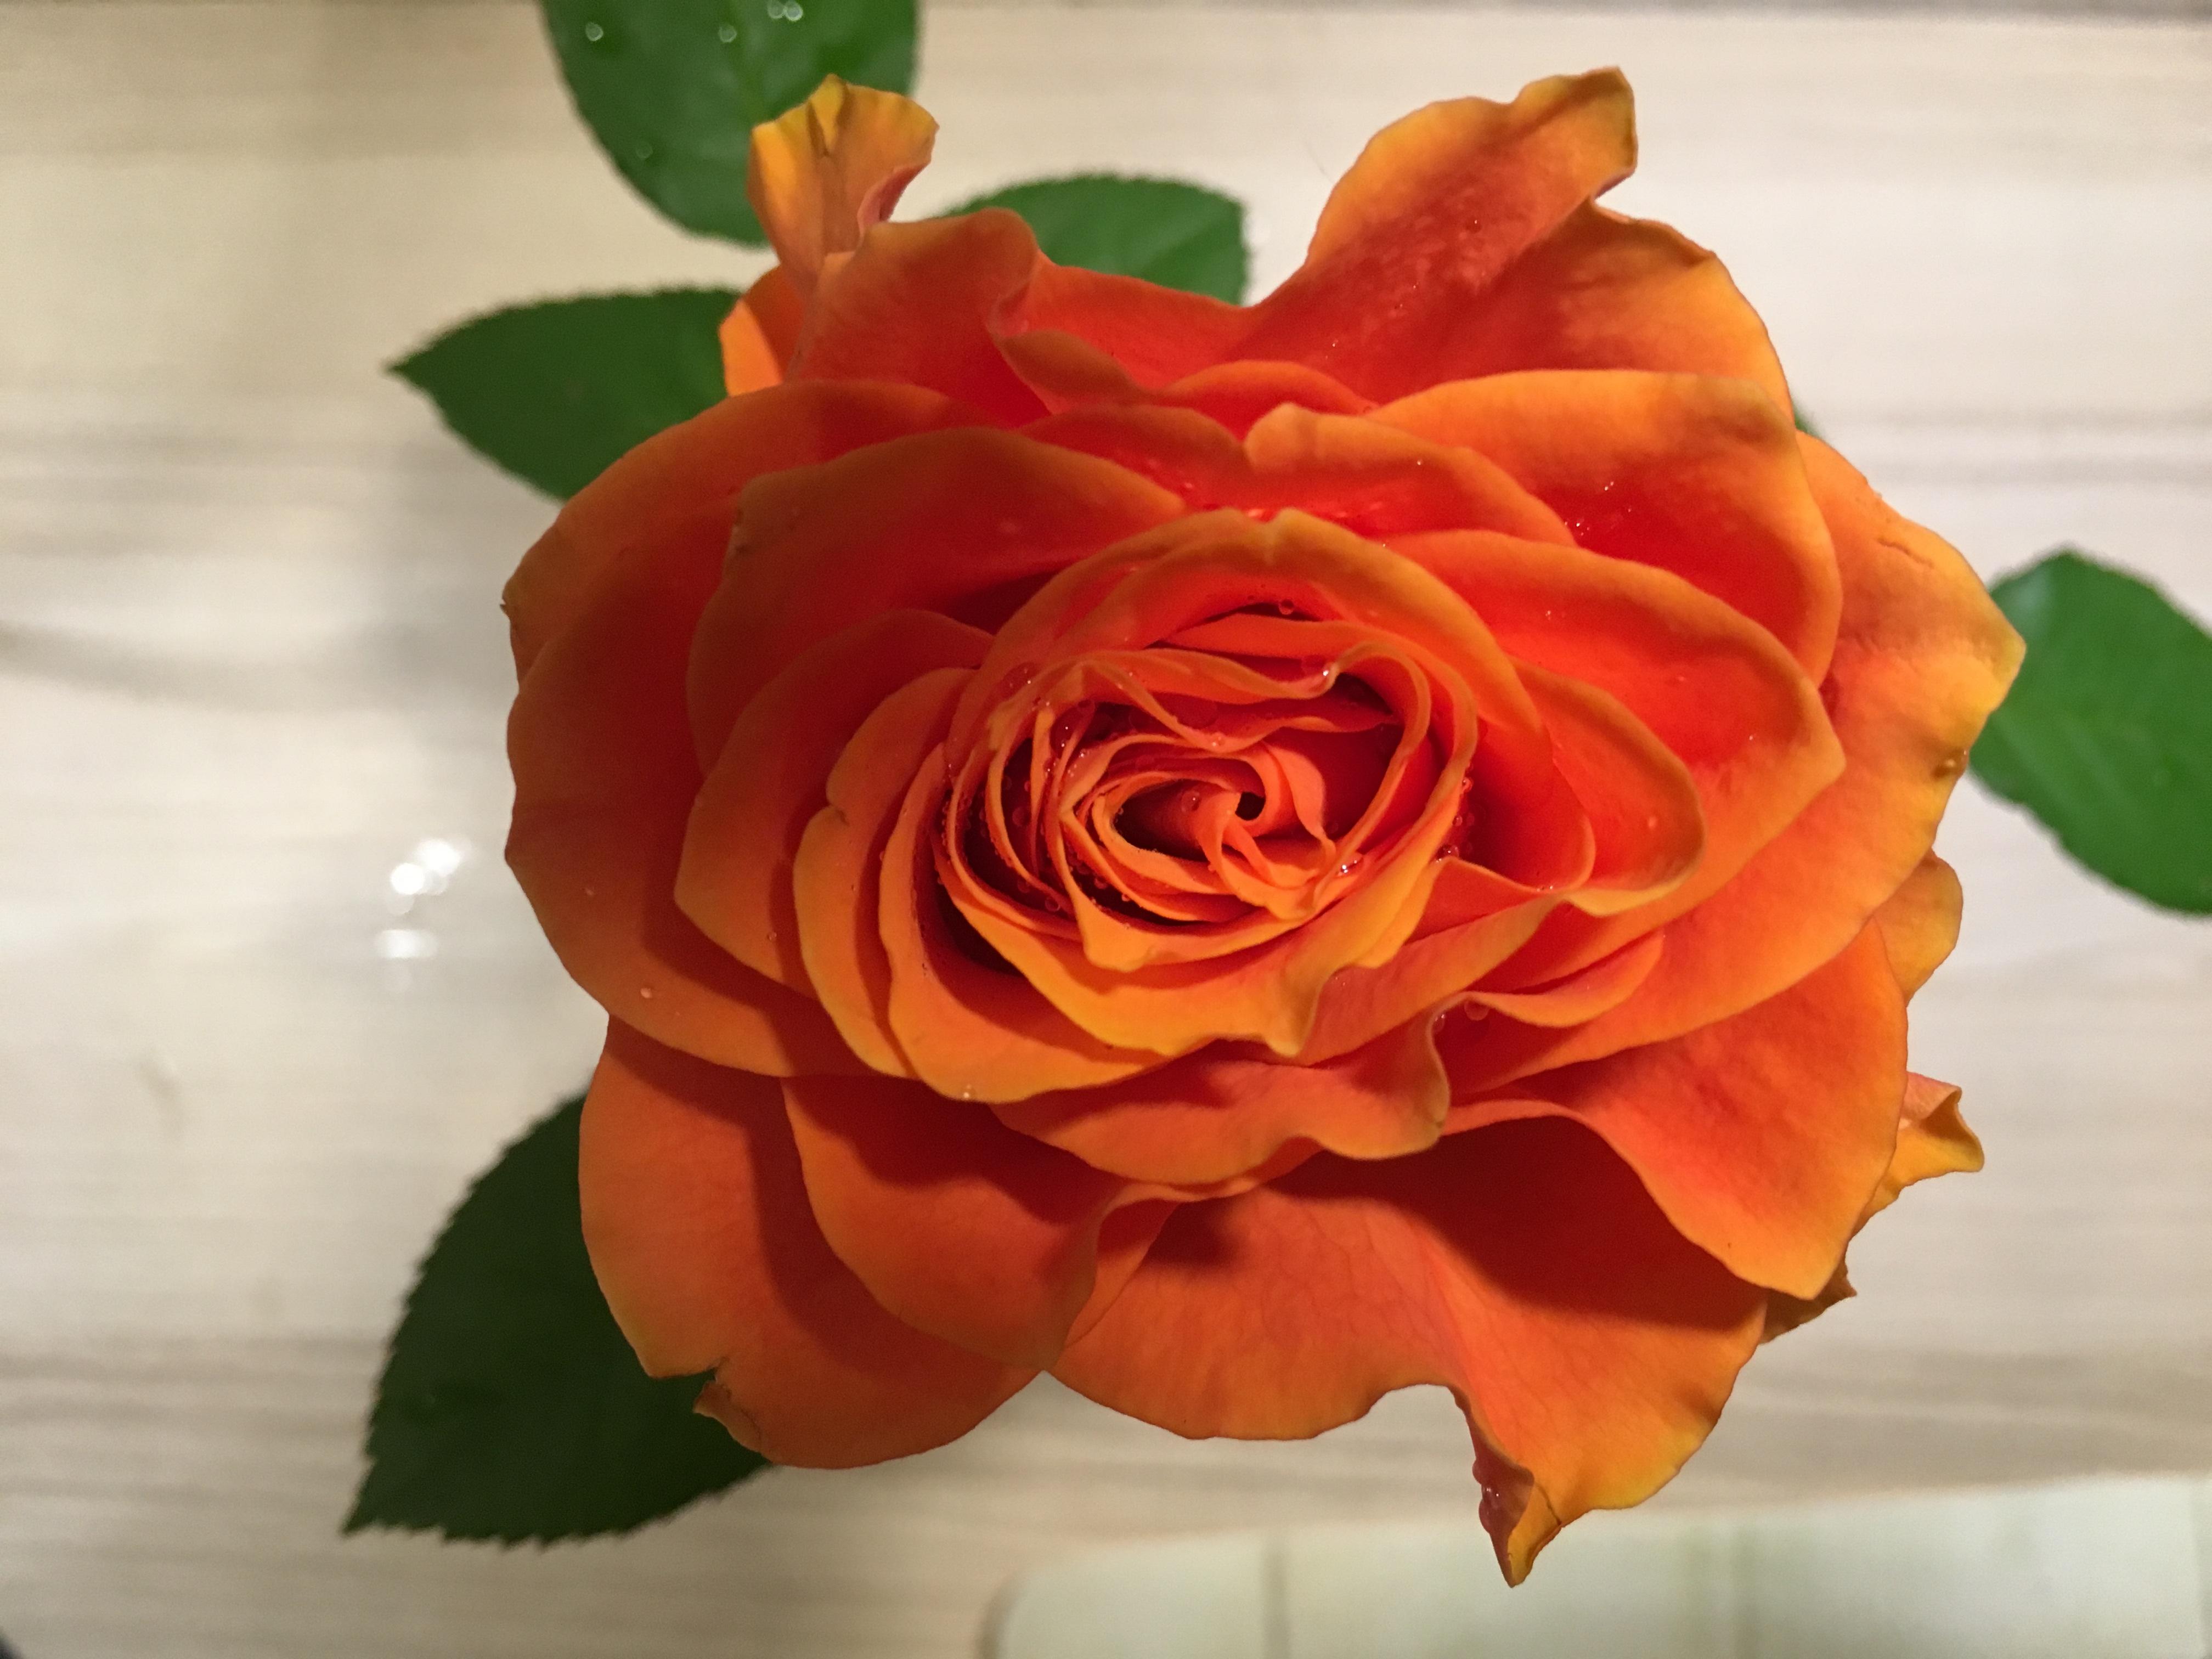 фото дополните розы цвета лосося фото почки, меняя при